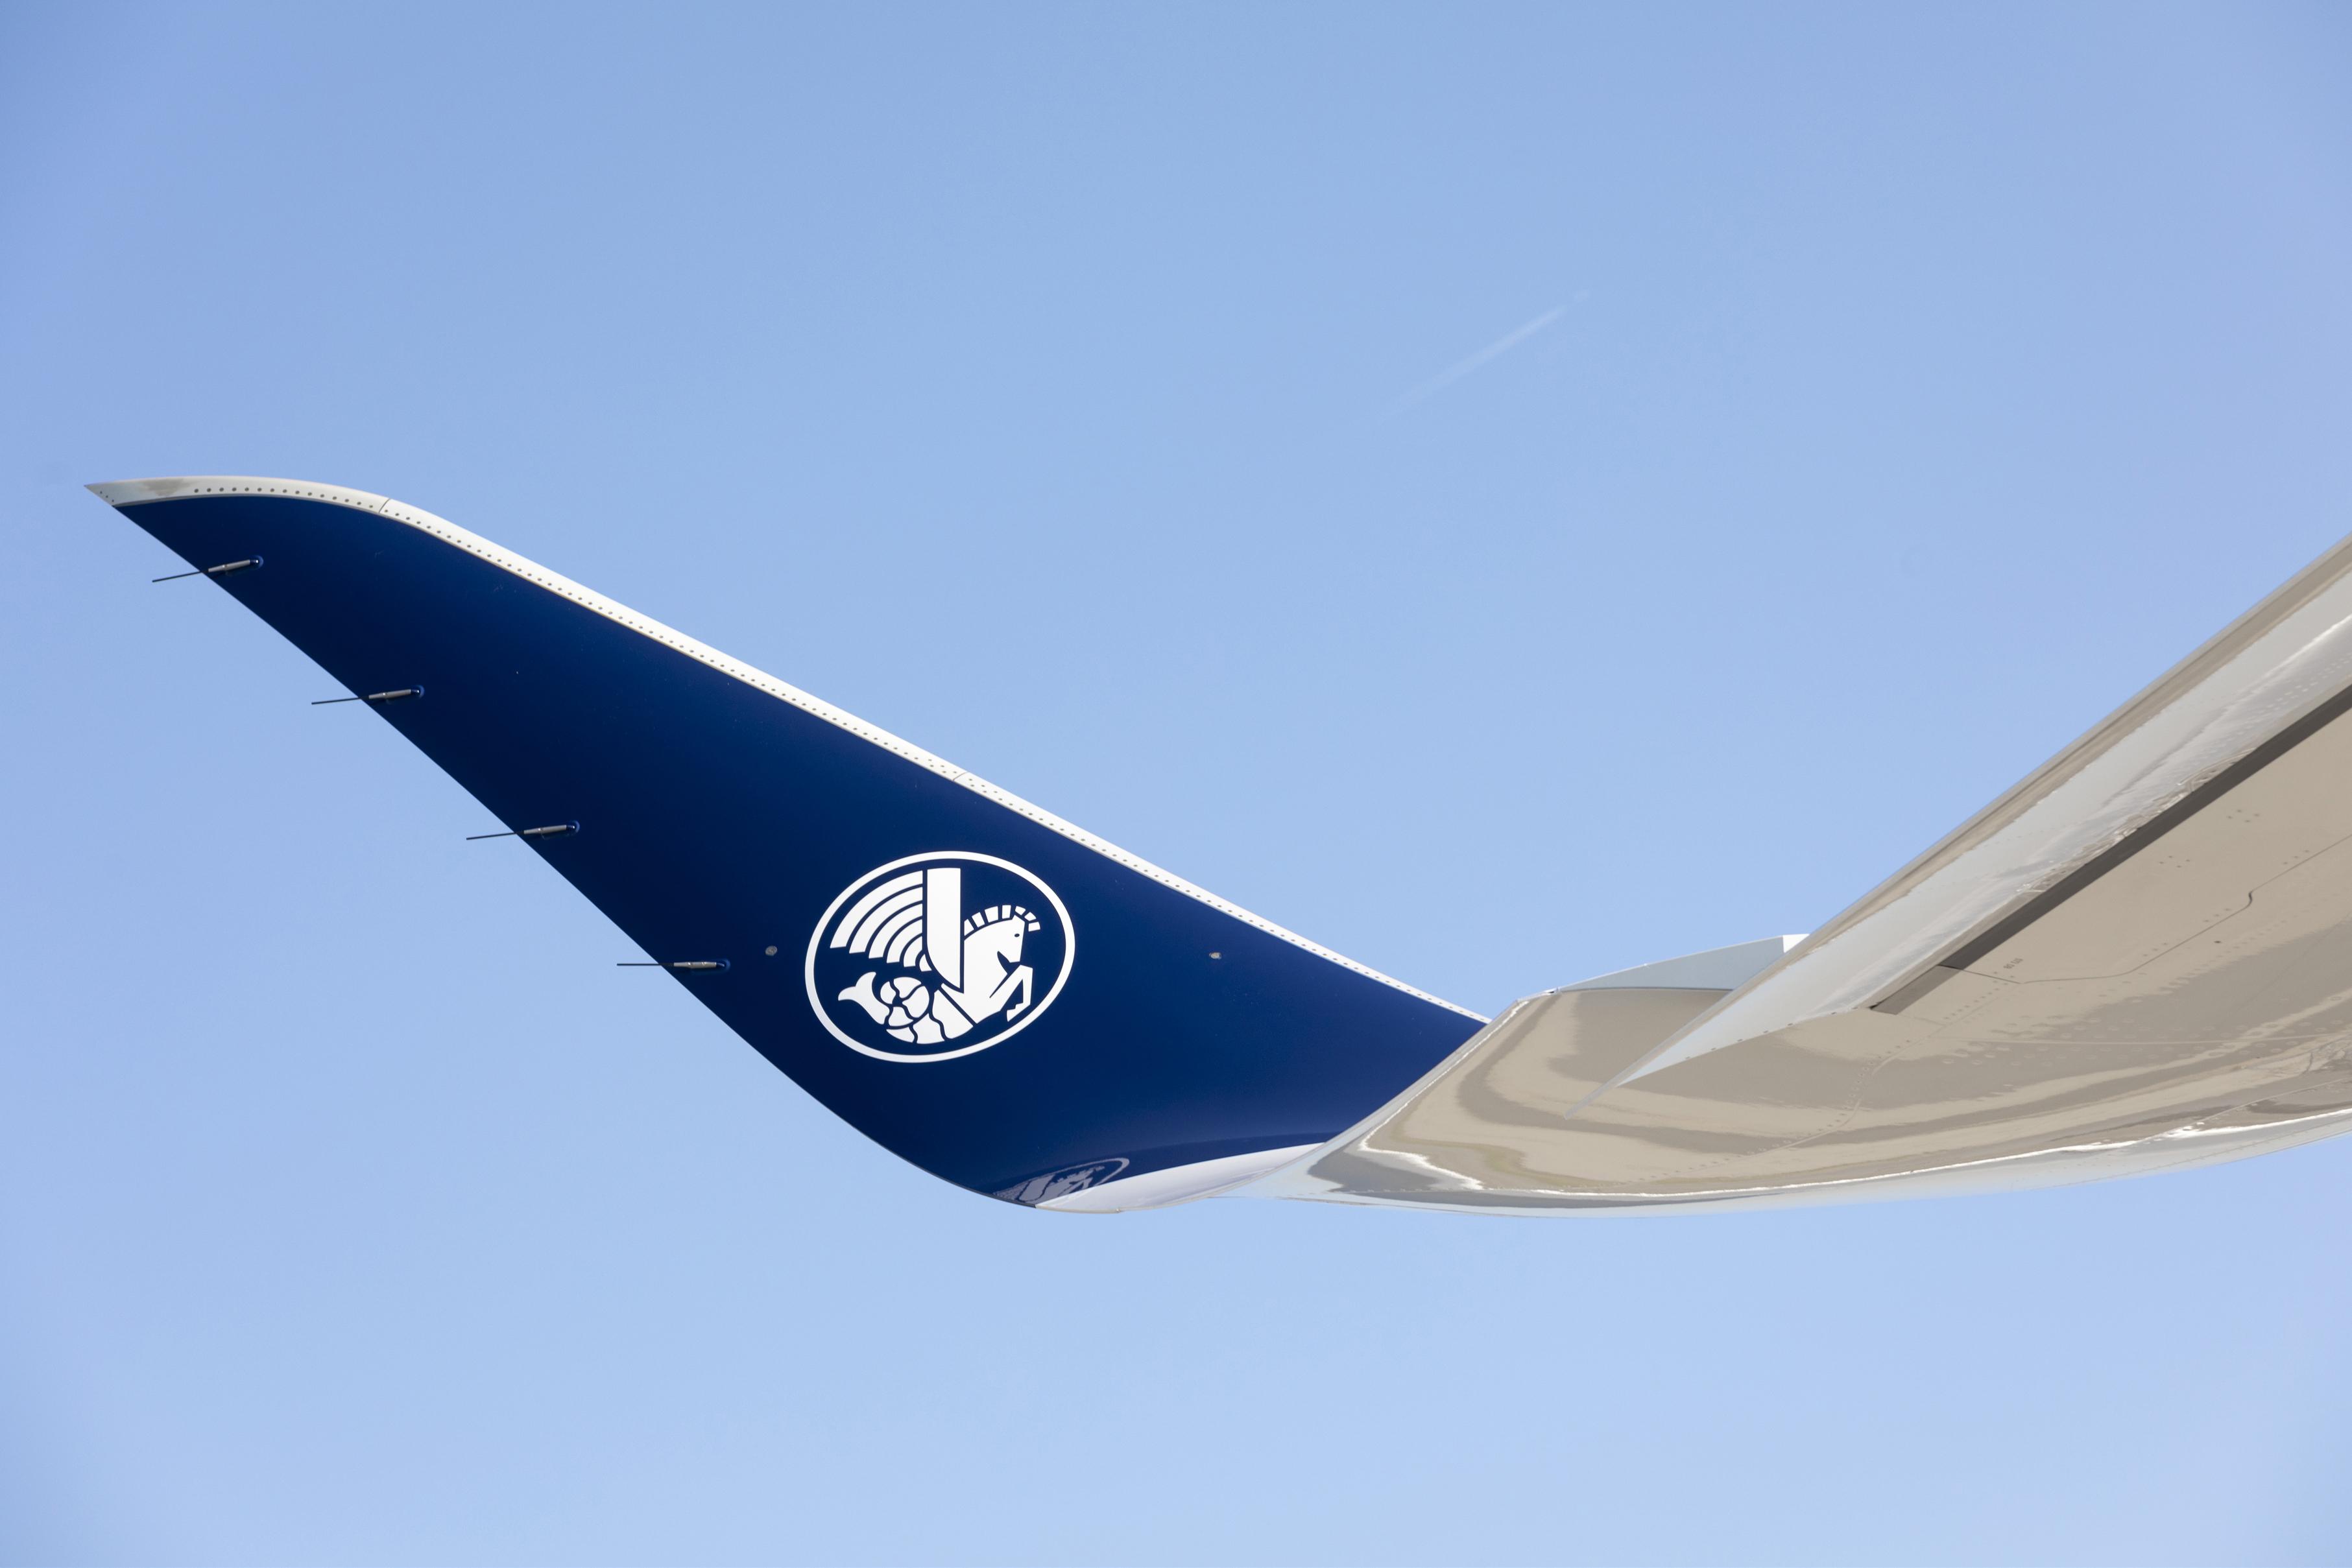 © Airbus SAS